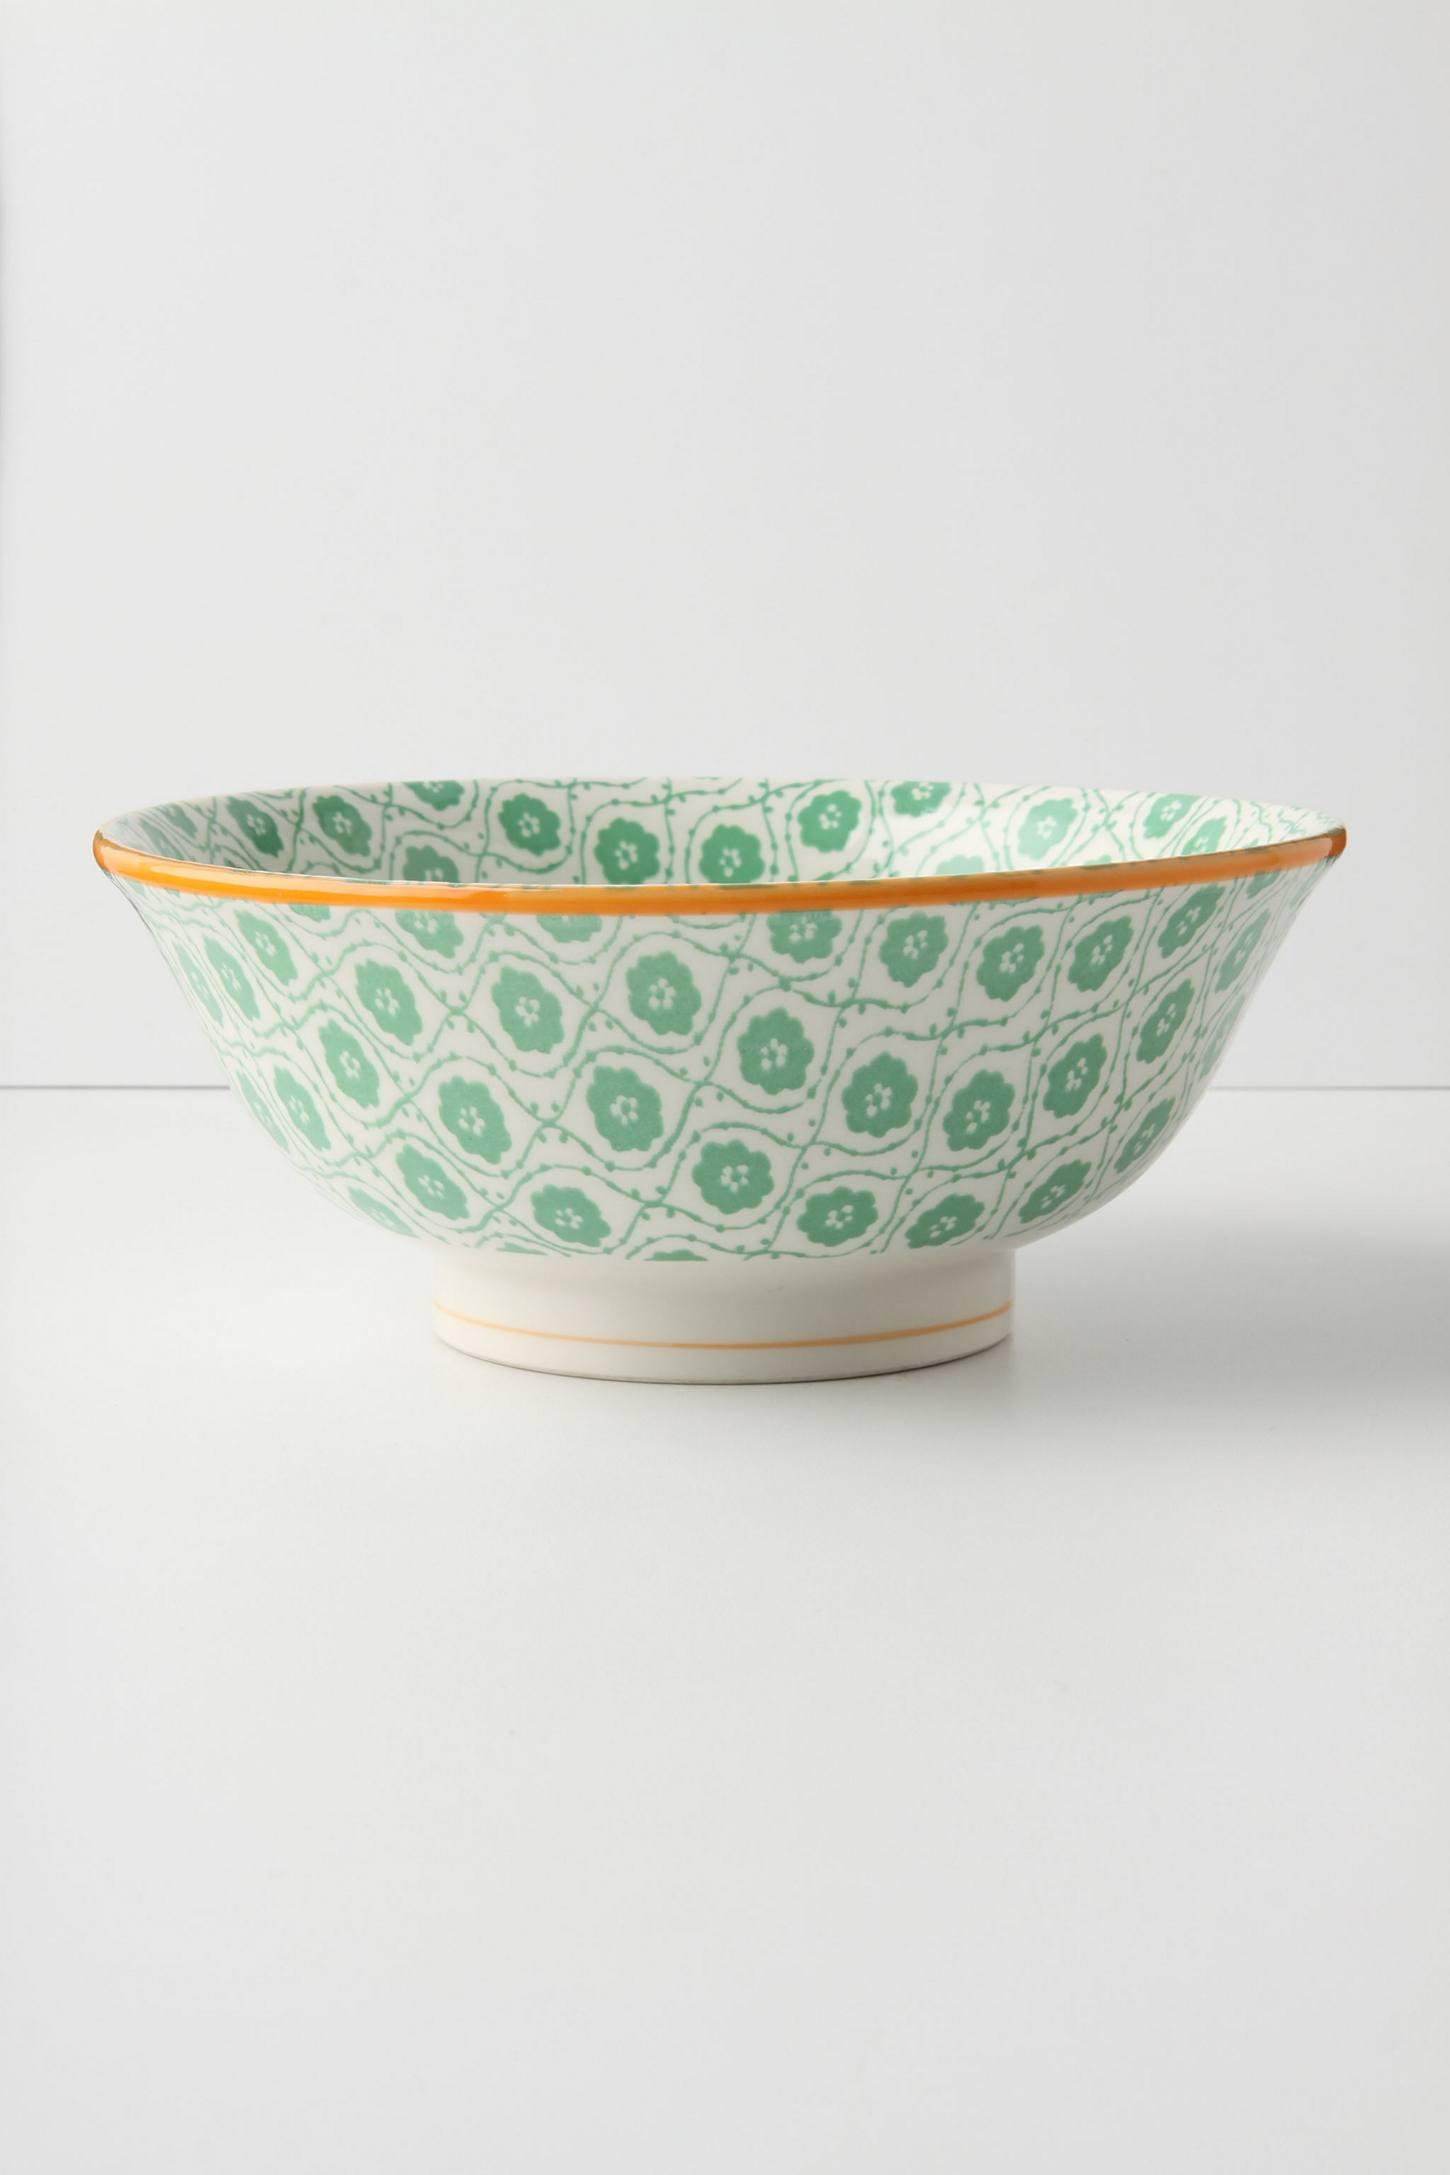 Atom Art Serving Bowl, Green